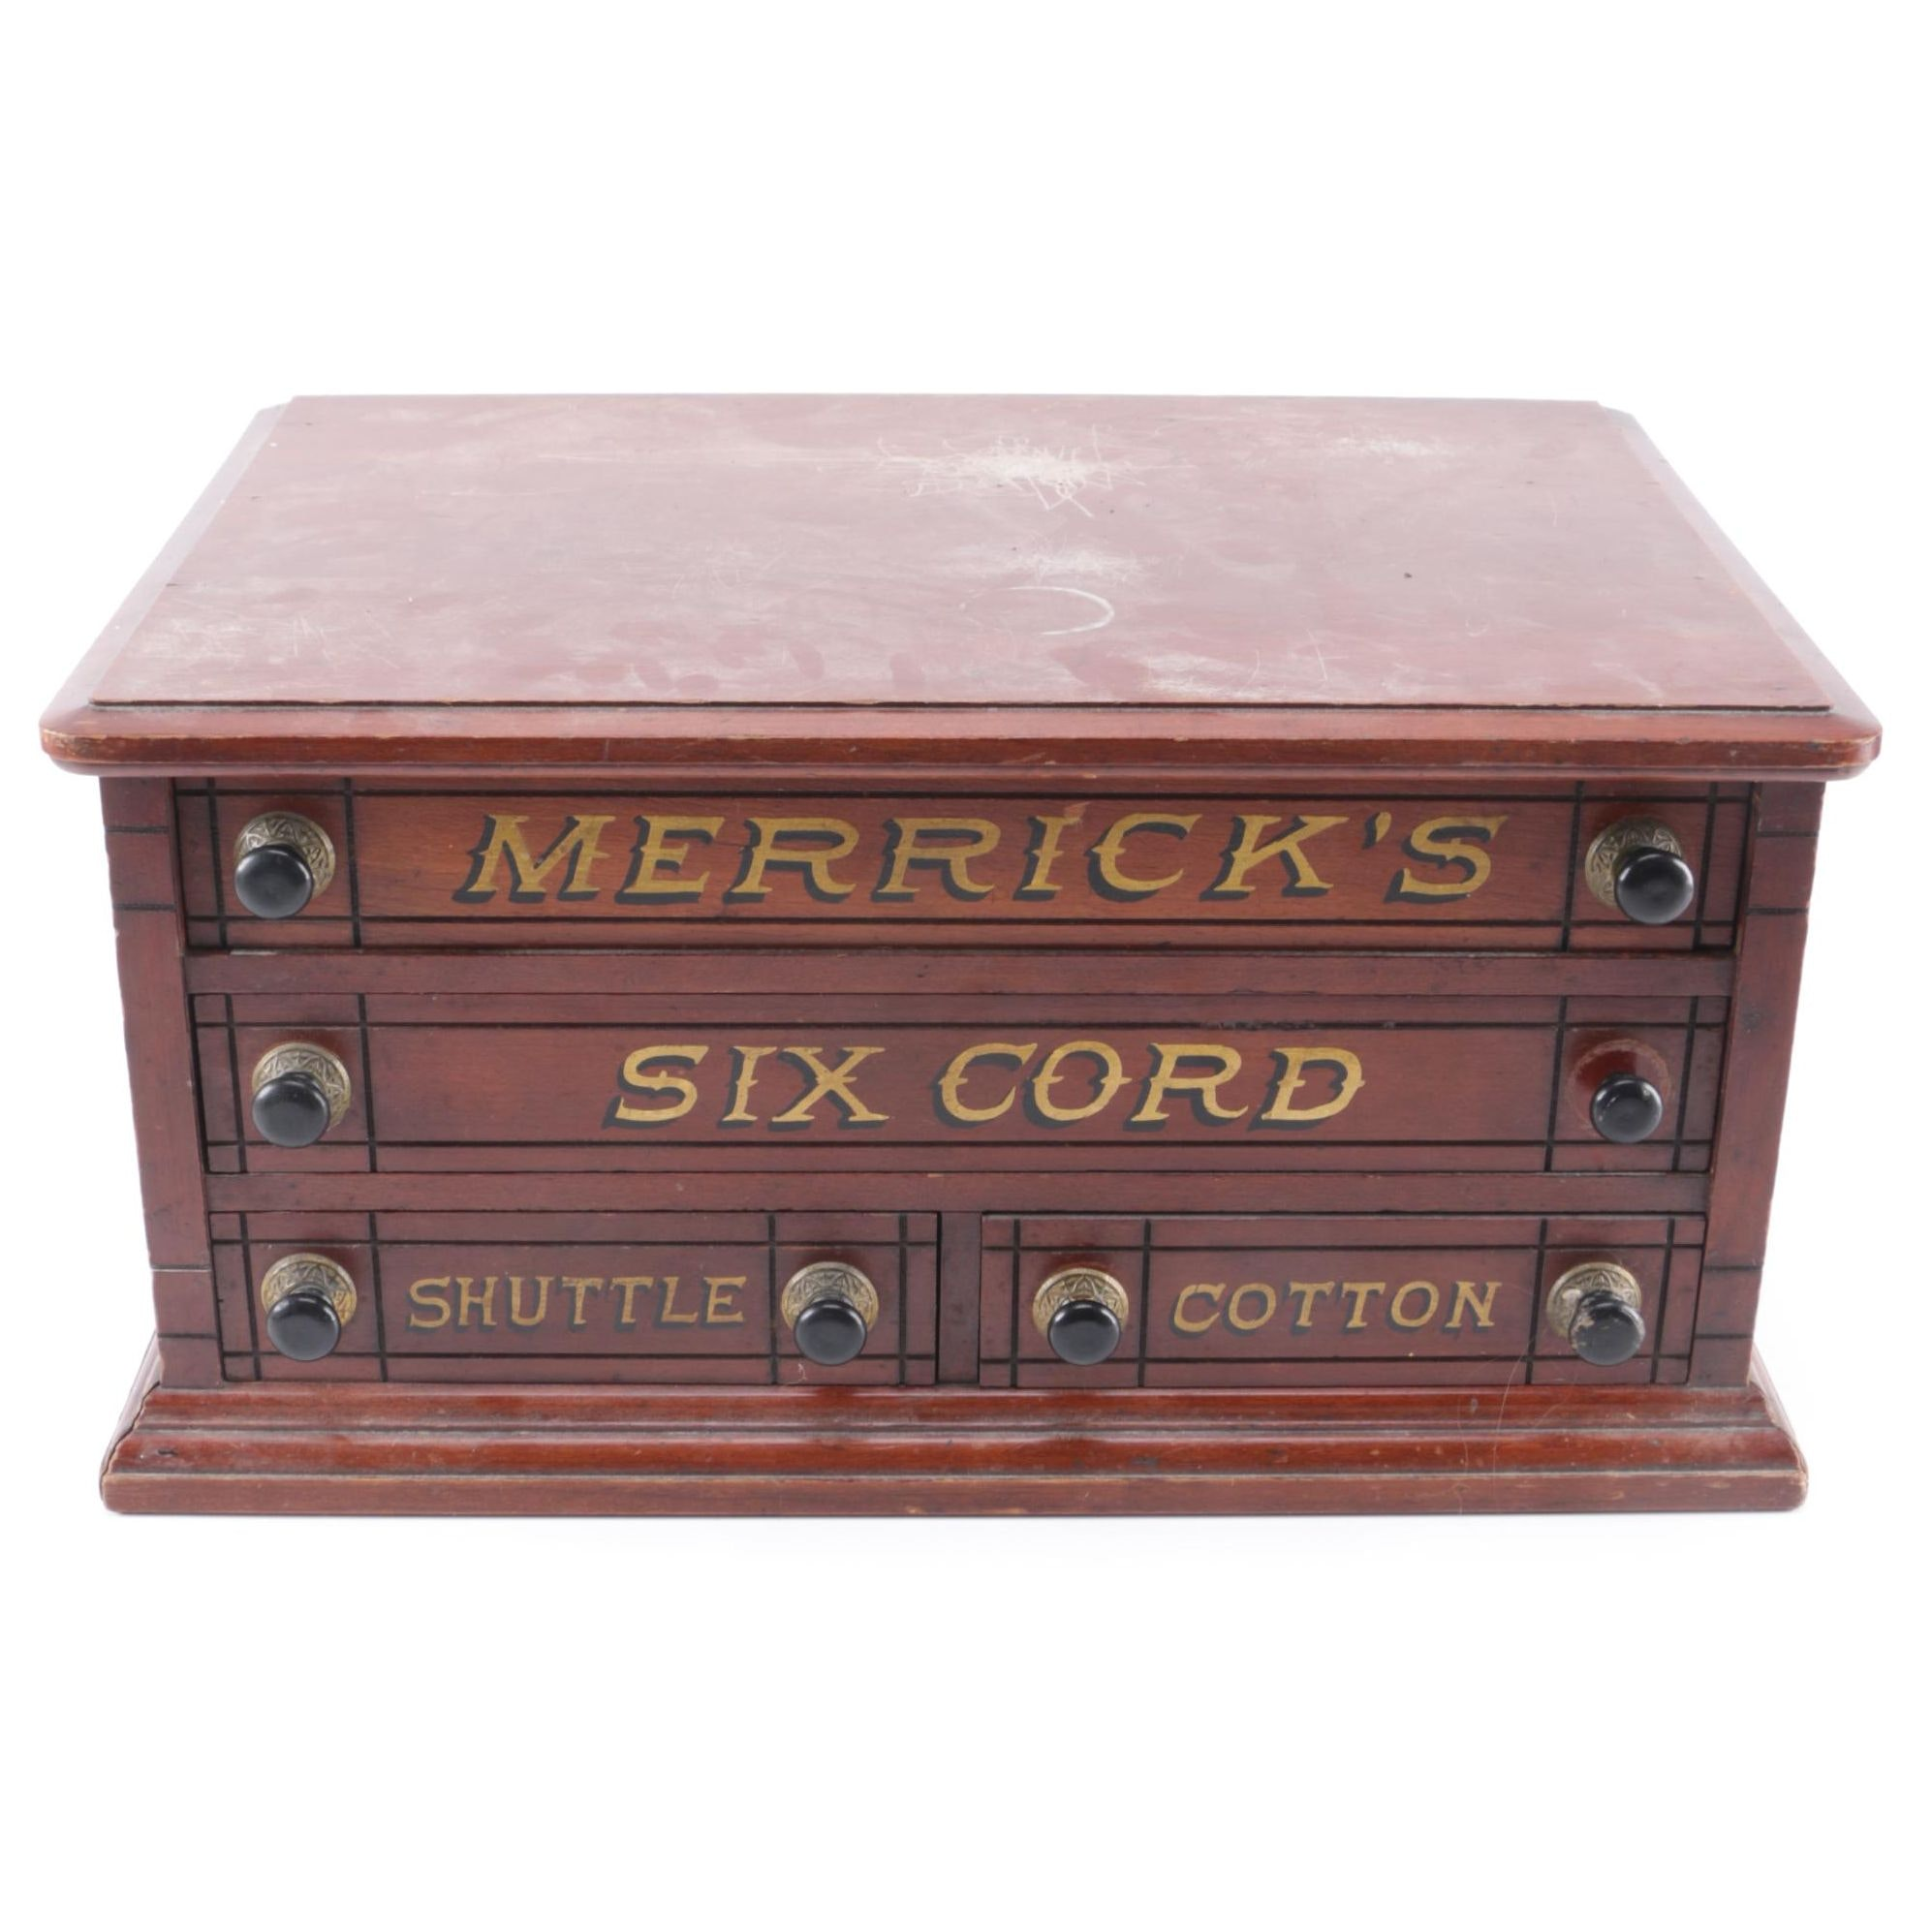 Antique Pine Merrick's Six Cord Shuttle Cotton Storage Box